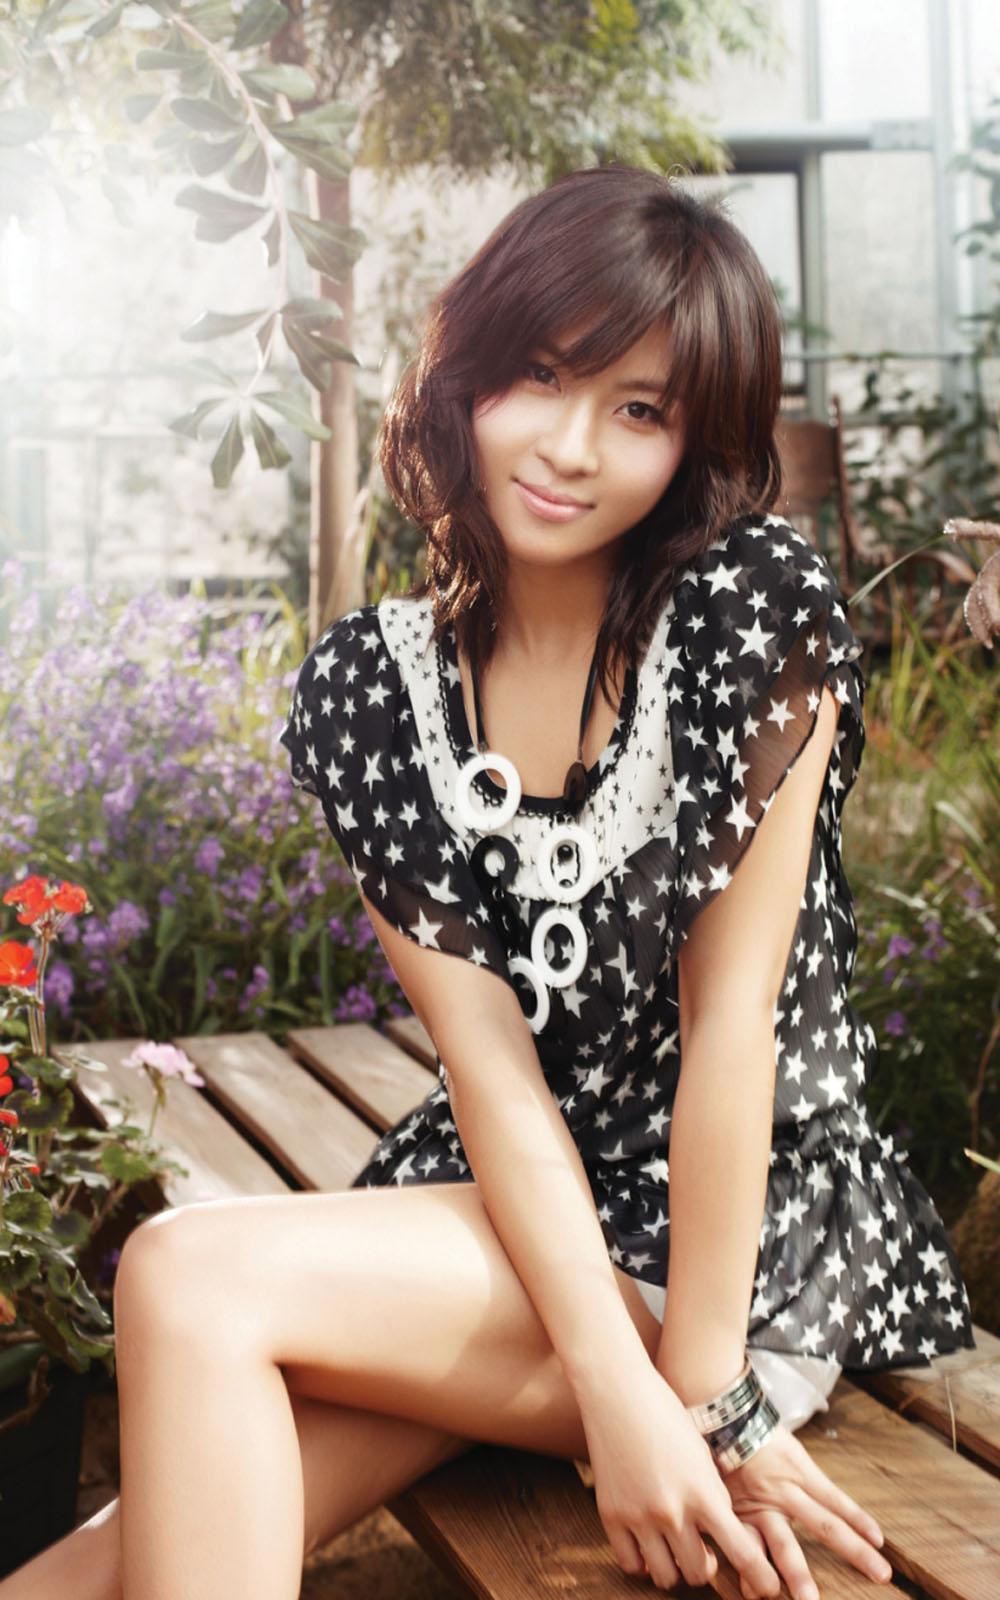 Ha Ji Won Images Wallpaper, HD Celebrities 4K Wallpapers